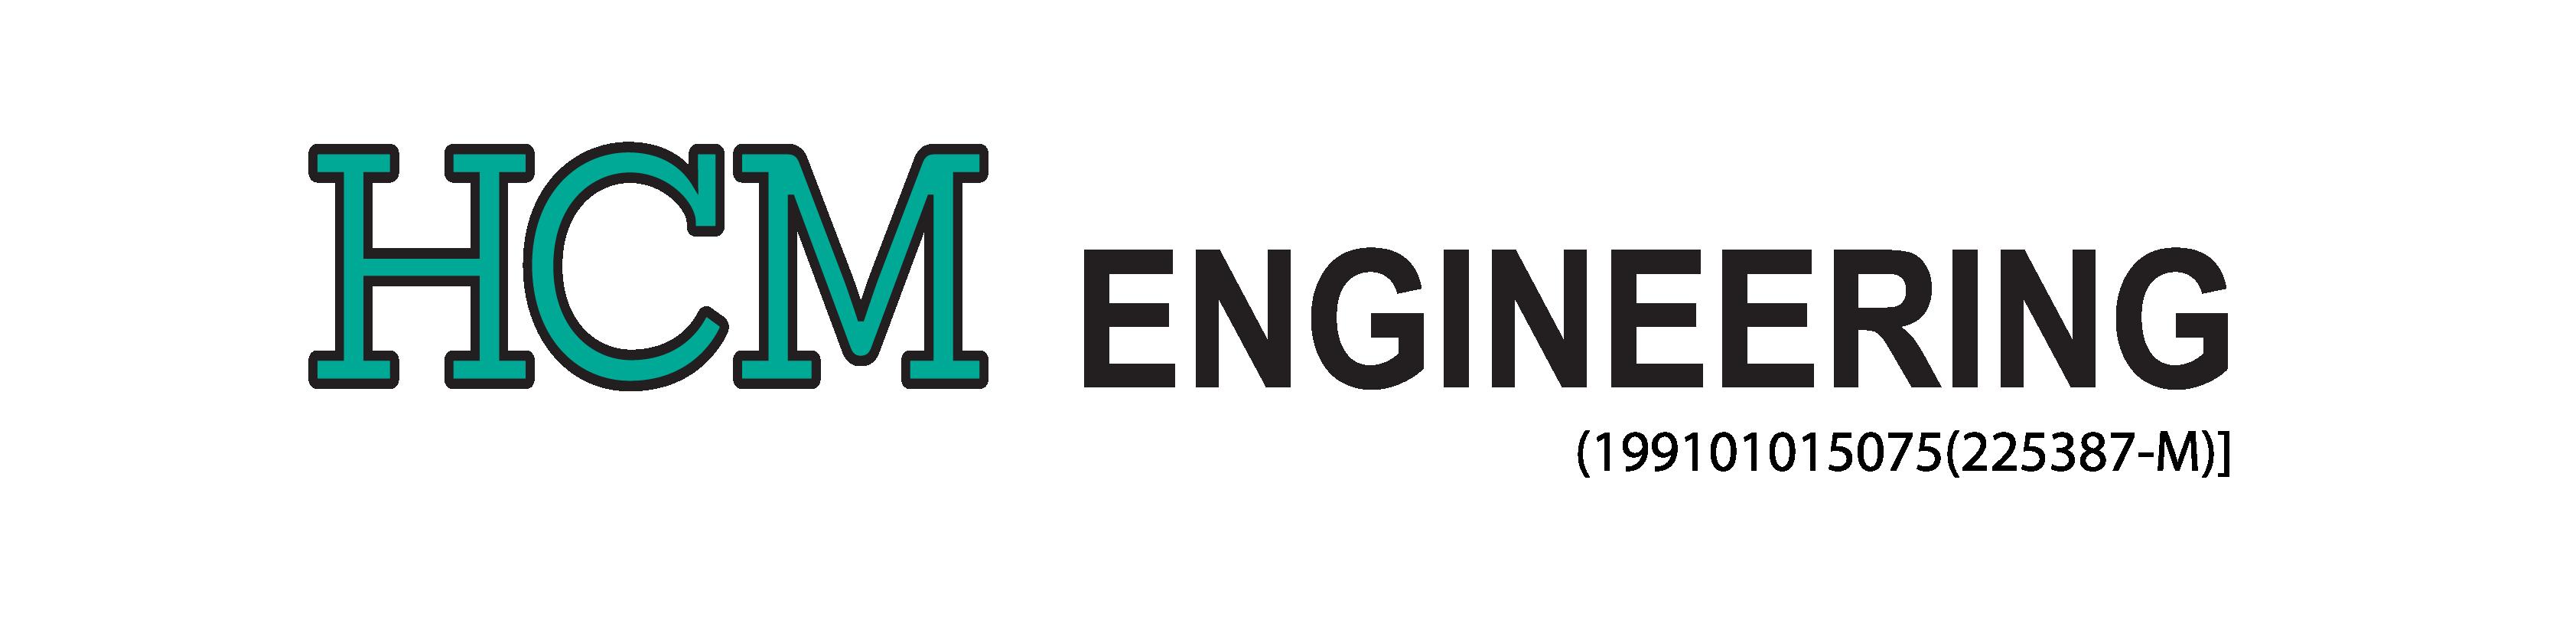 HCM Engineering Sdn Bhd